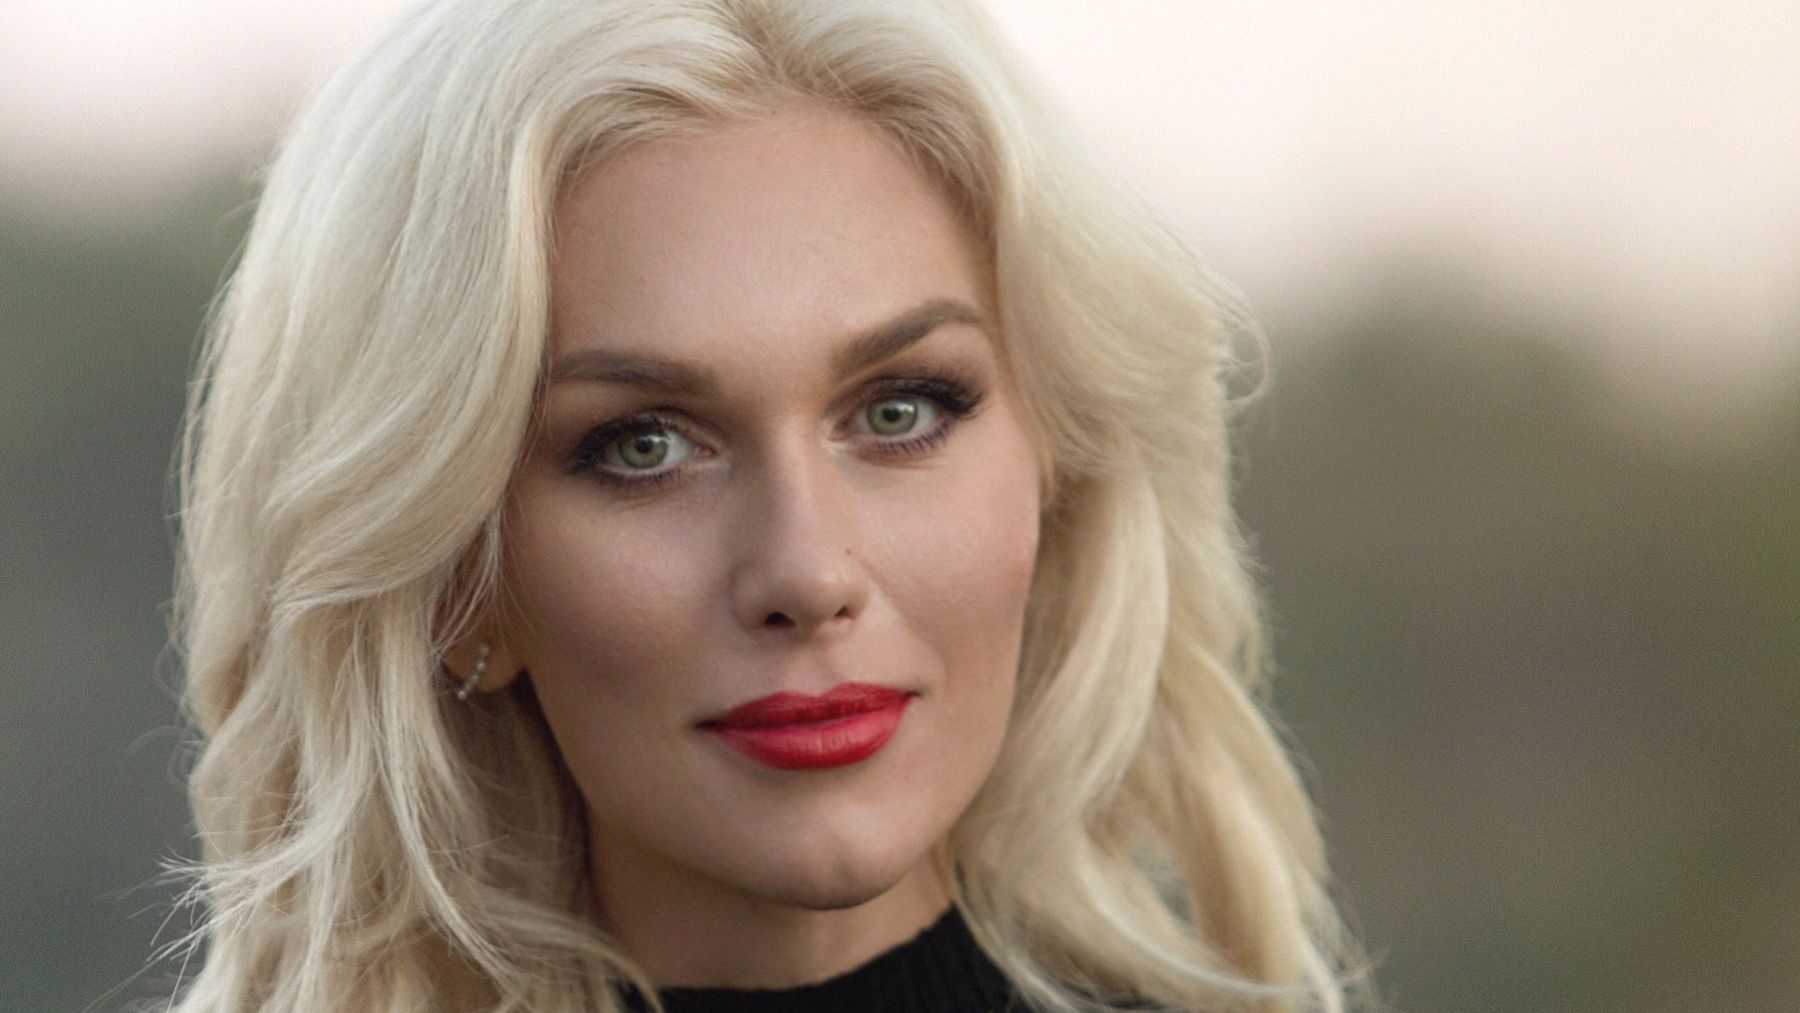 La actriz brasileña Ludmila Dayer celebra hoy su santo